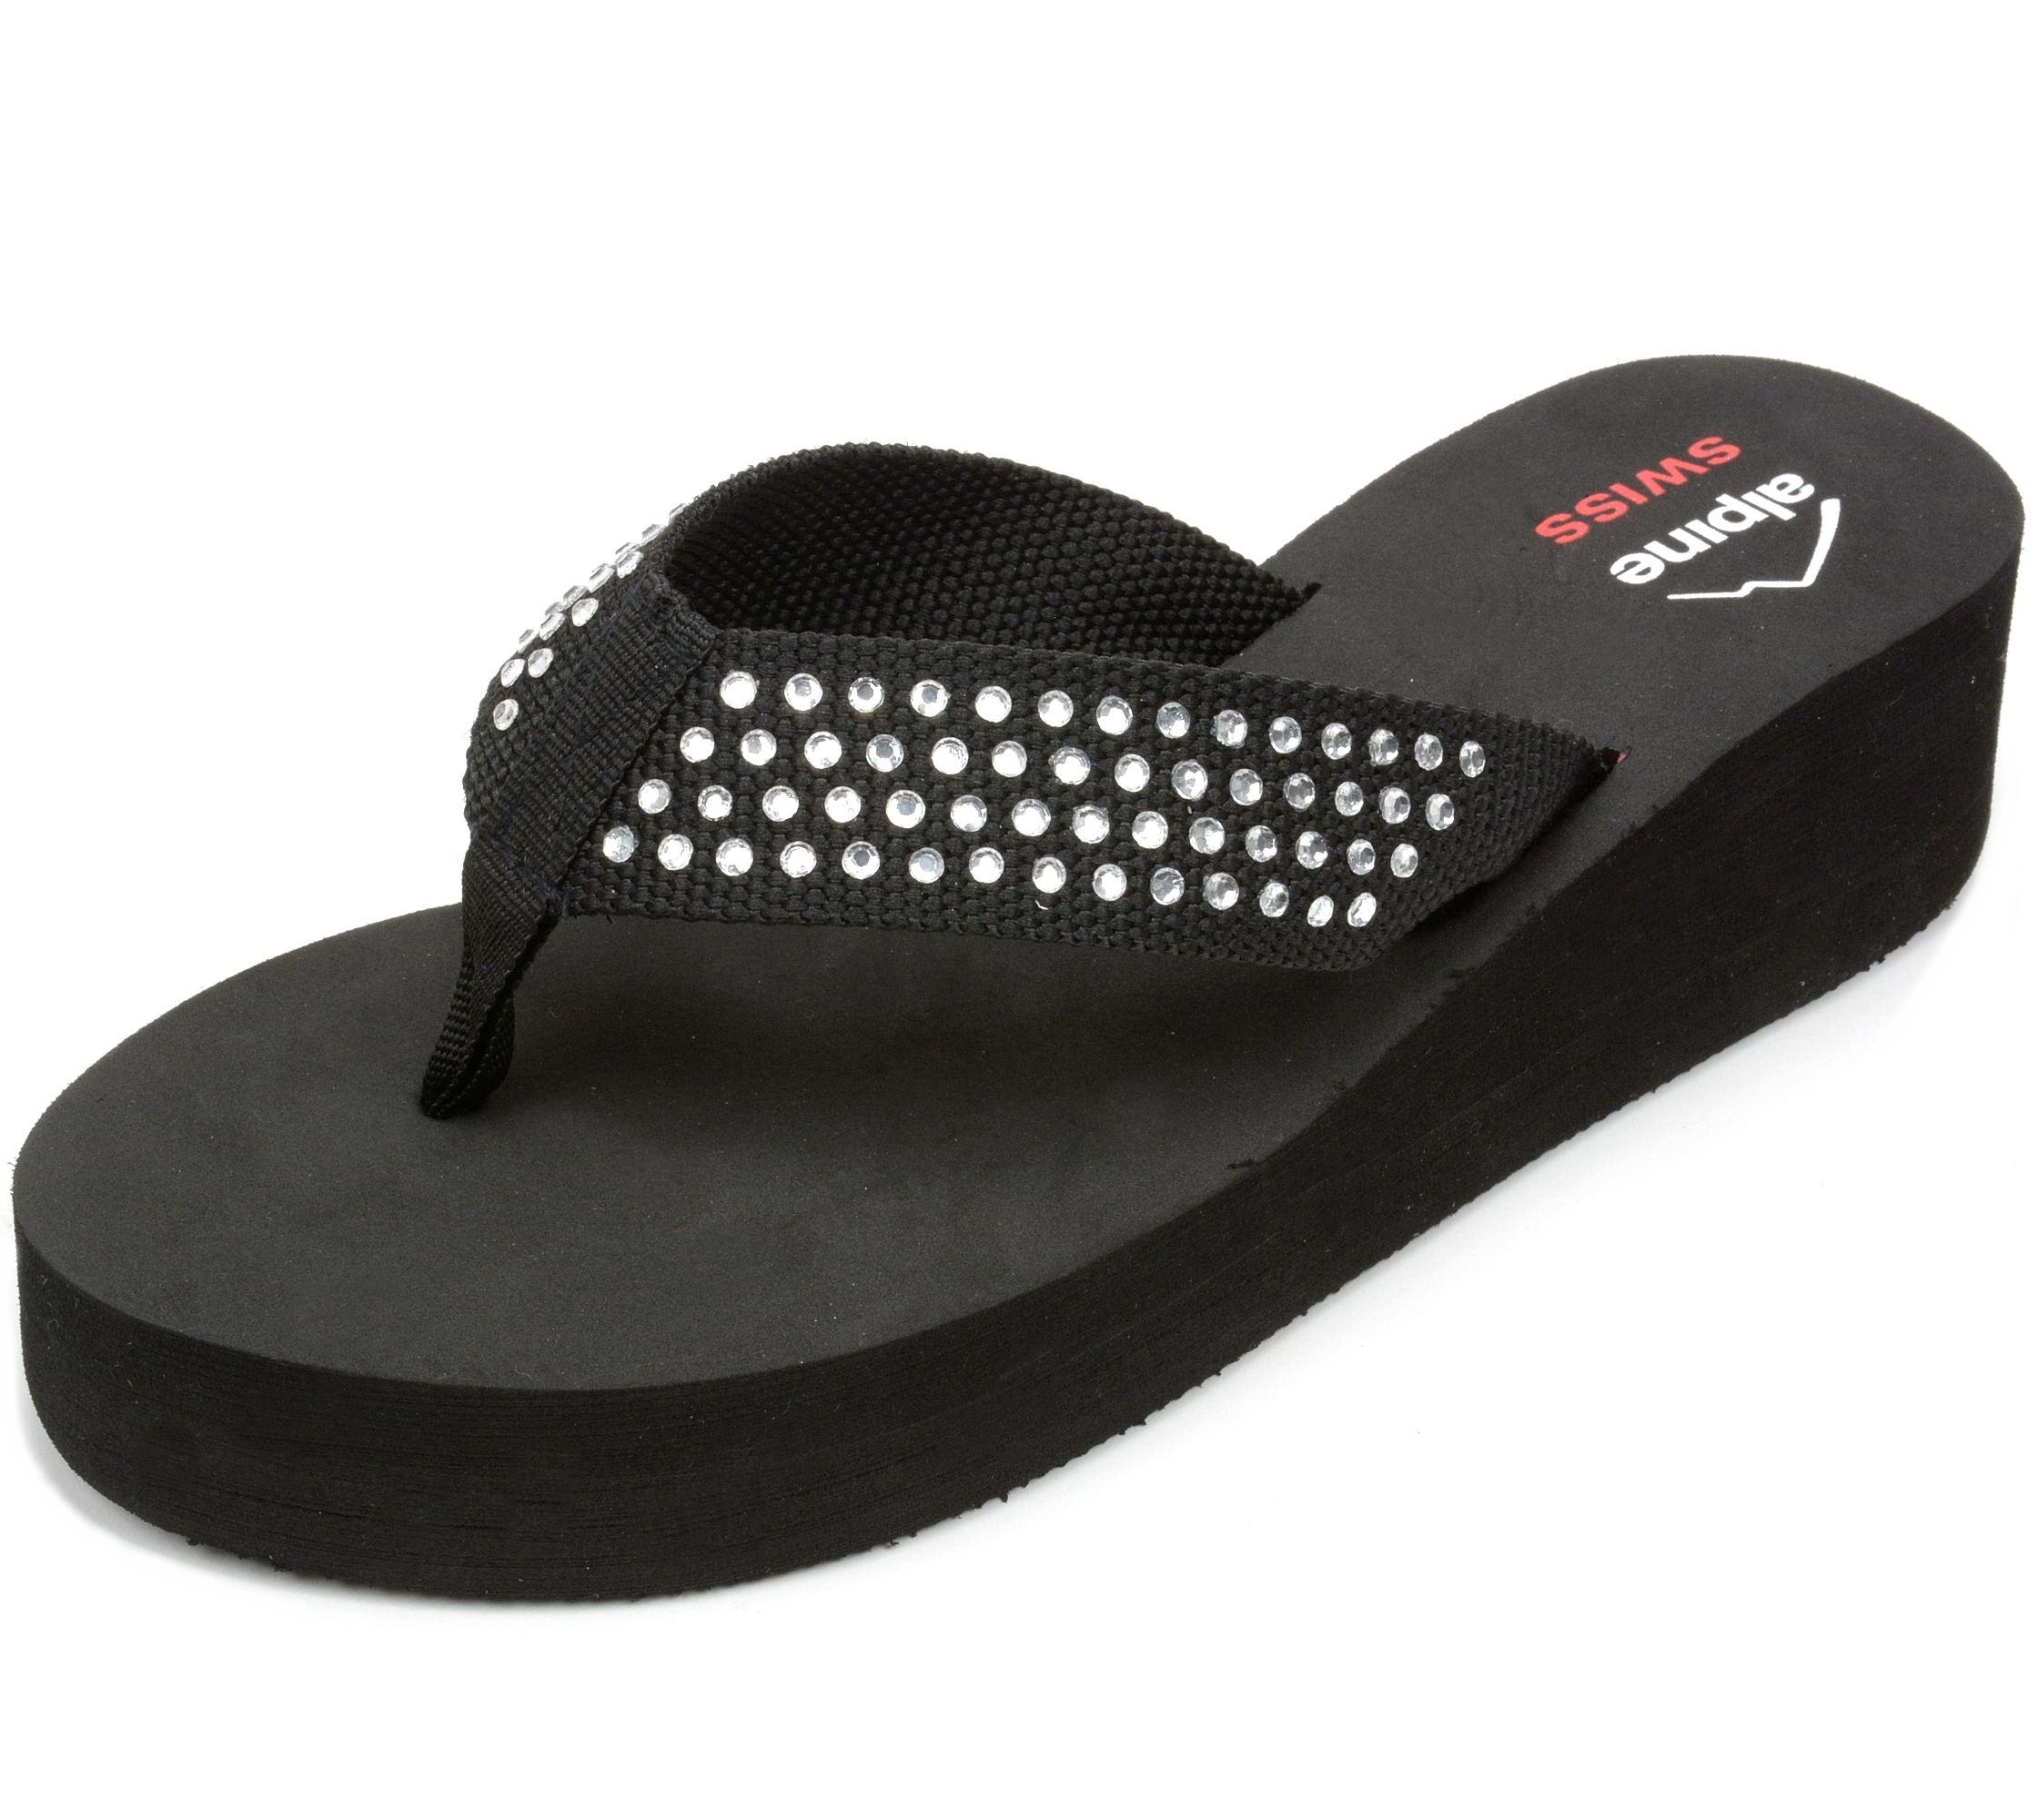 alpine swiss womens flip flops thong sandals rhinestone. Black Bedroom Furniture Sets. Home Design Ideas